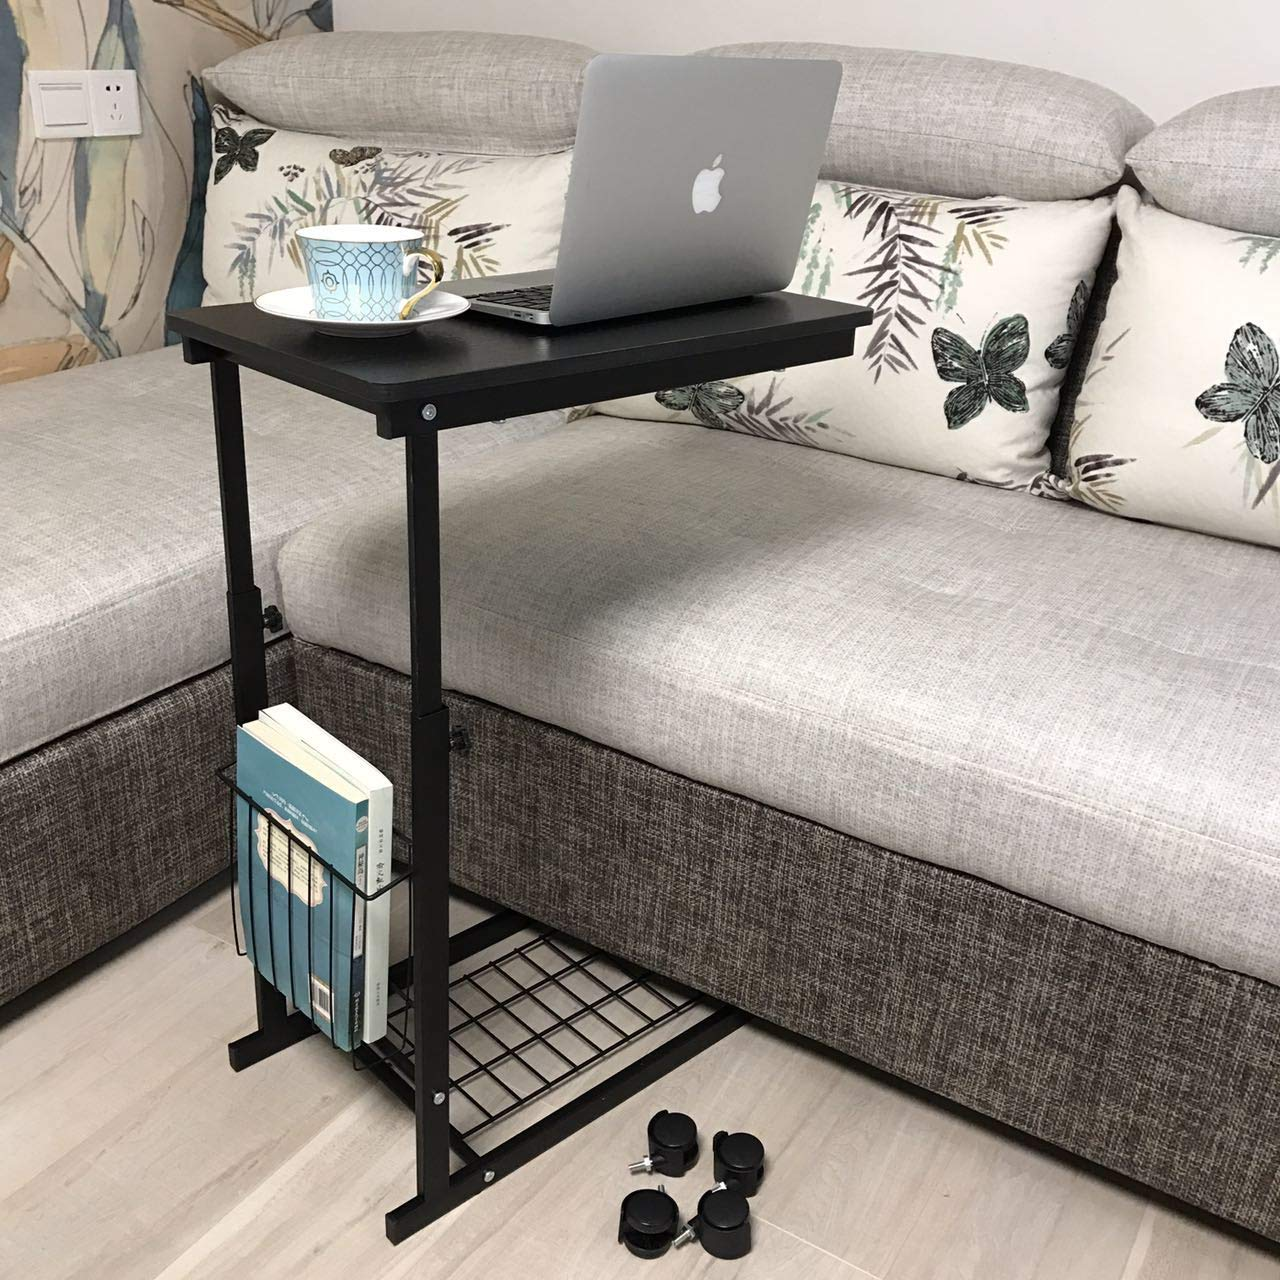 Height Adjustable Sofa Side Table Wheel Mobile Computer Desk